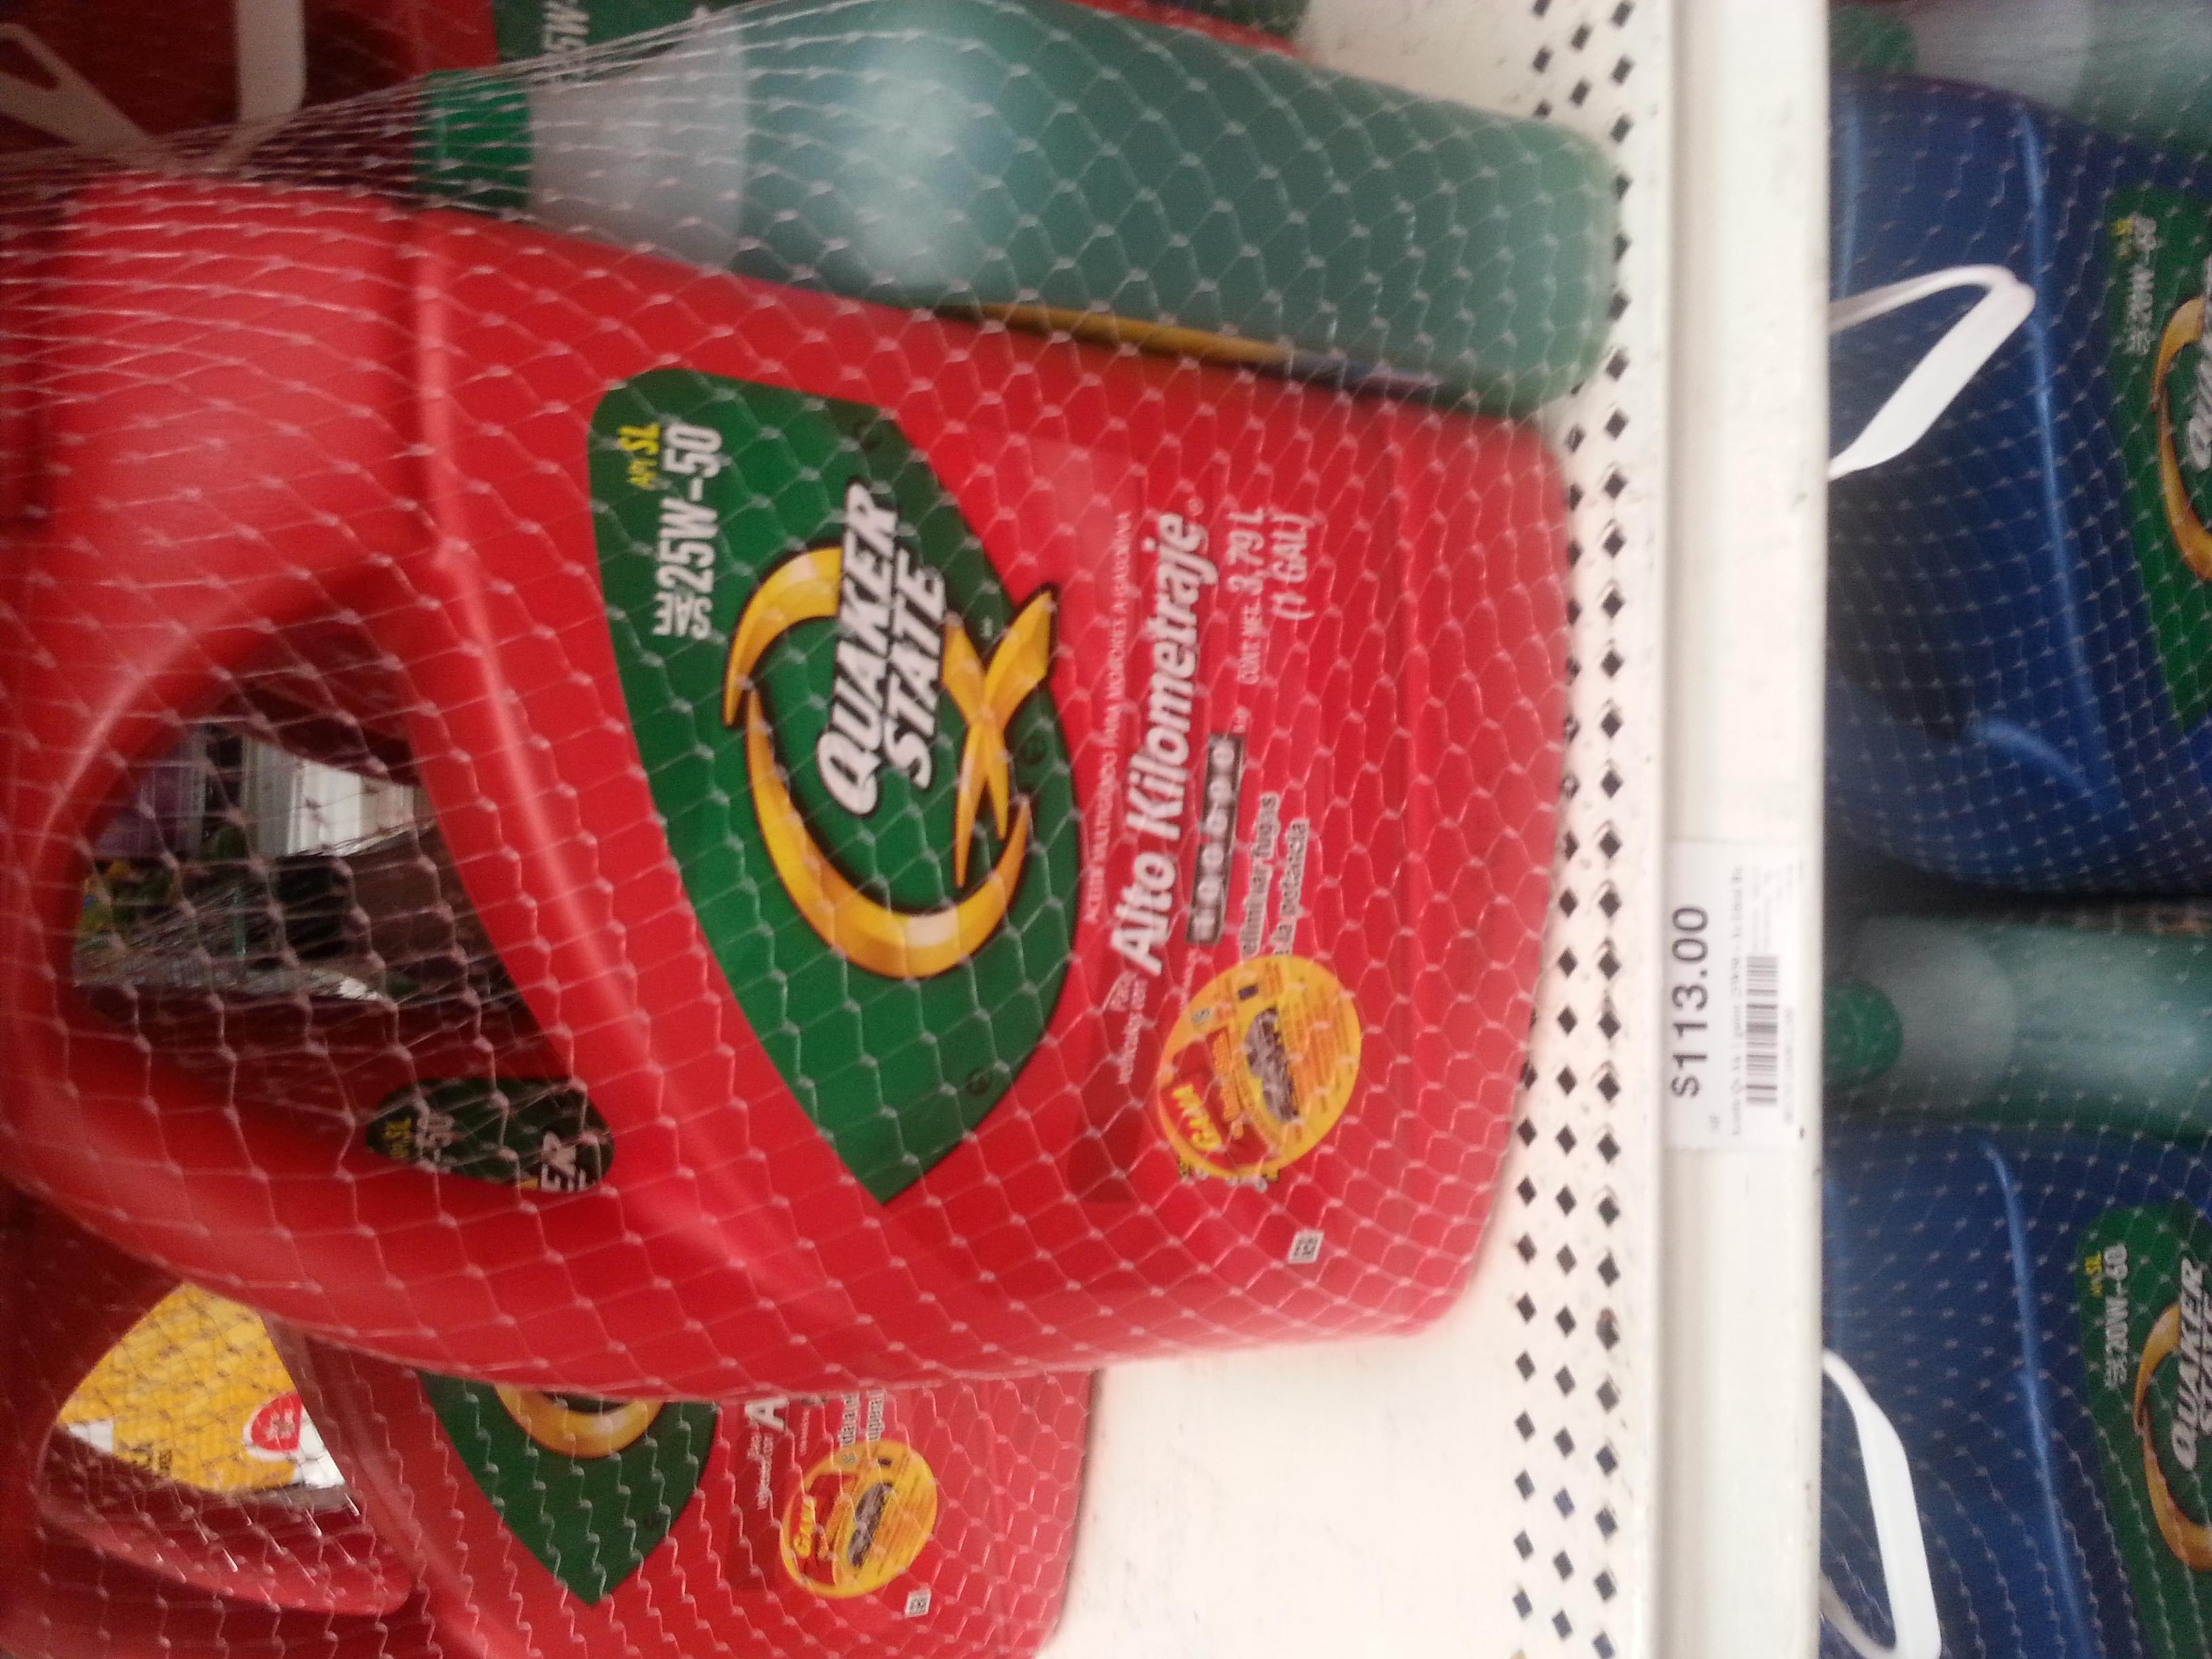 Chedraui: Aceite para auto Quaker de 1 galón + 1L de Anticongelante a $113